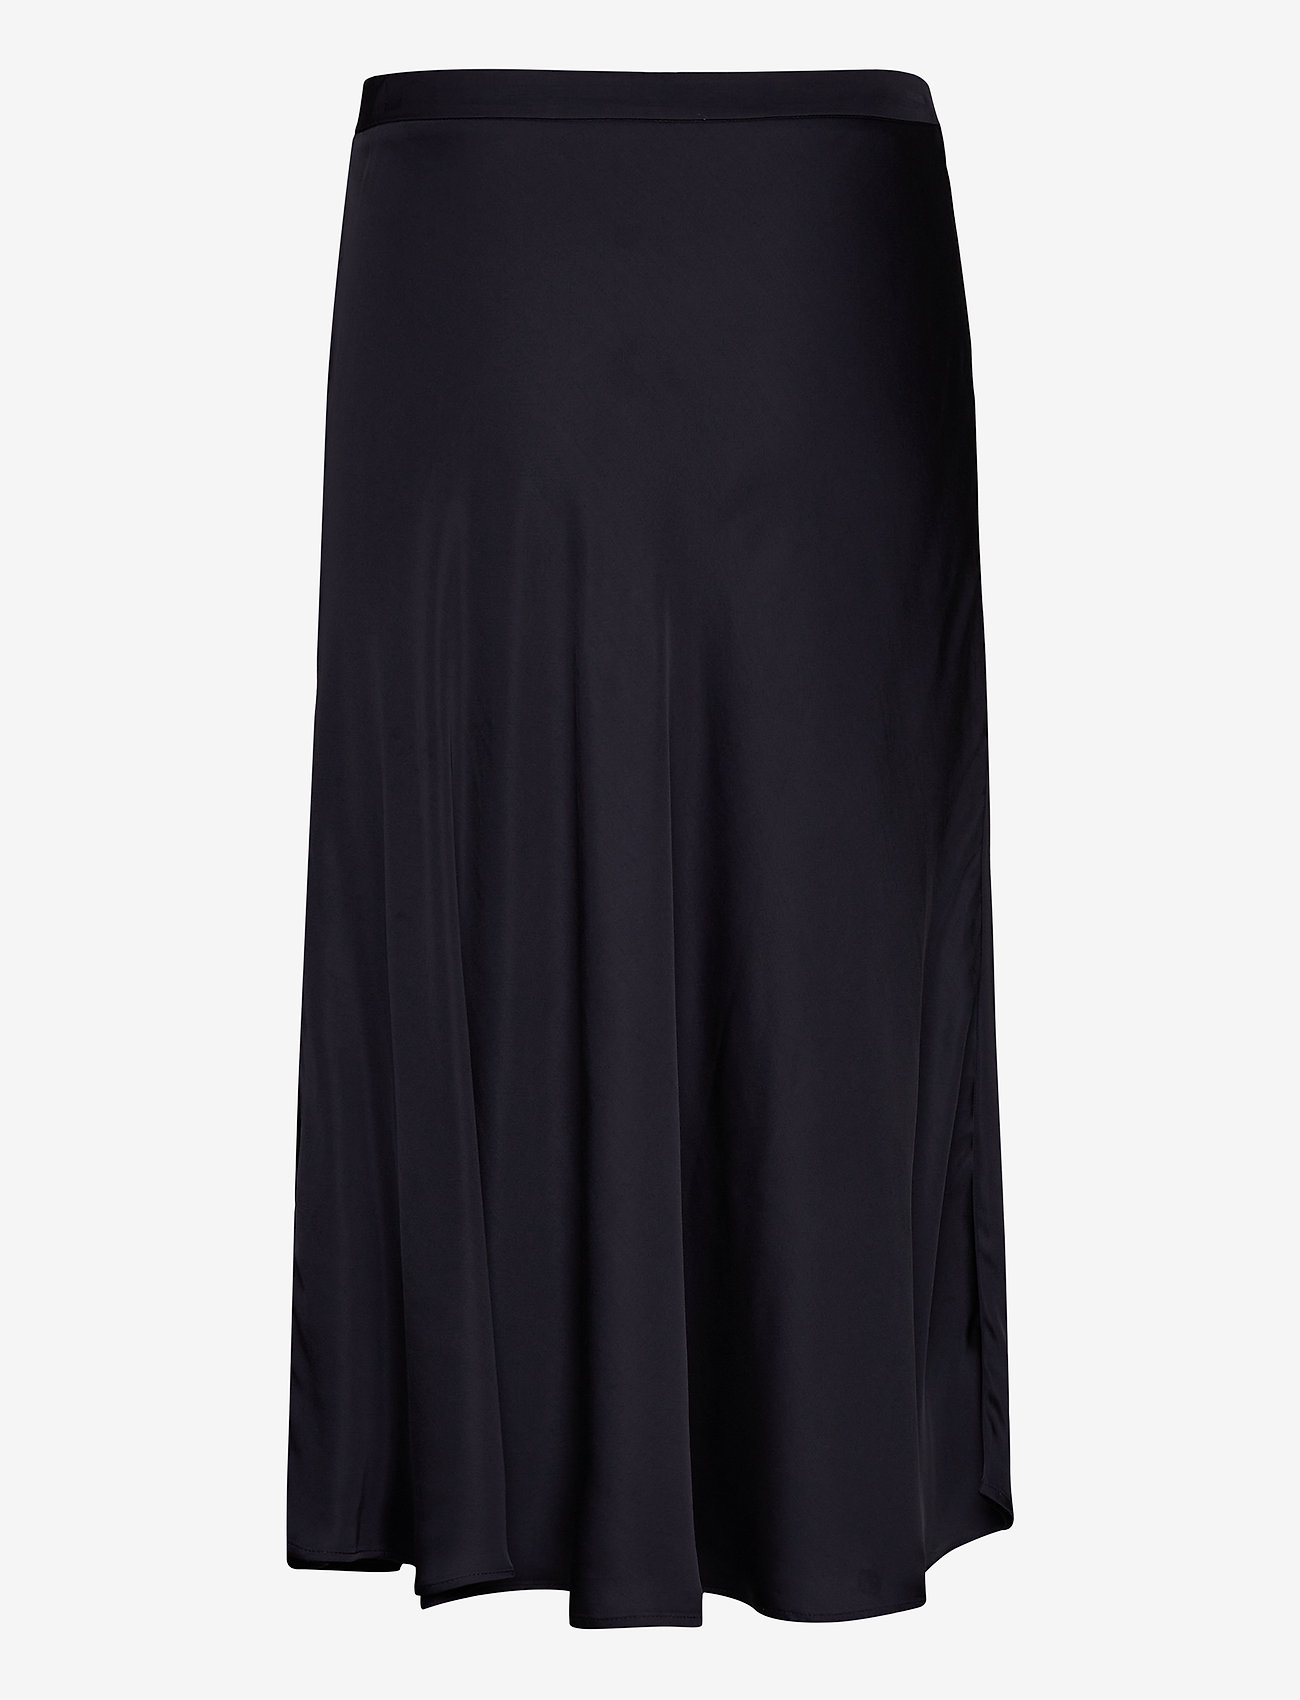 Morris Lady Julie Skirt - Skirts